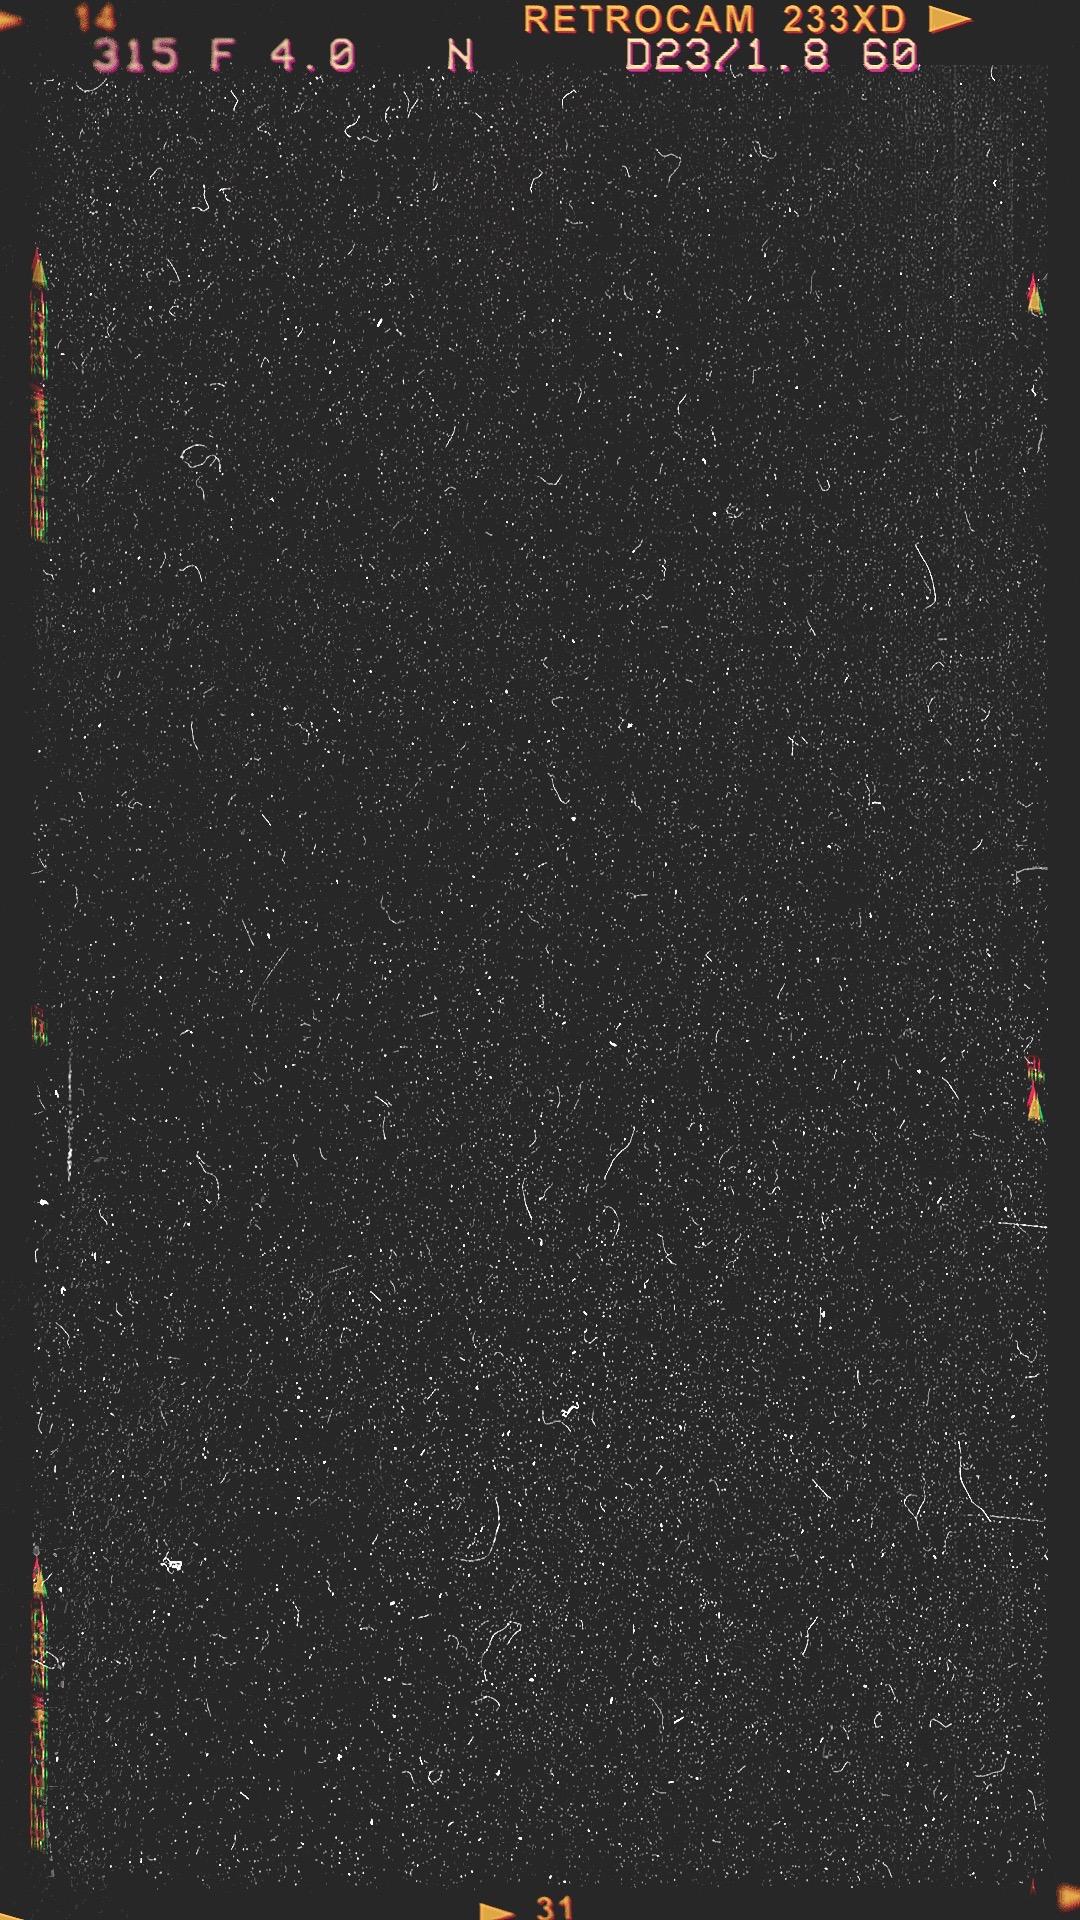 Dark Backgrounds 5 (JPG)